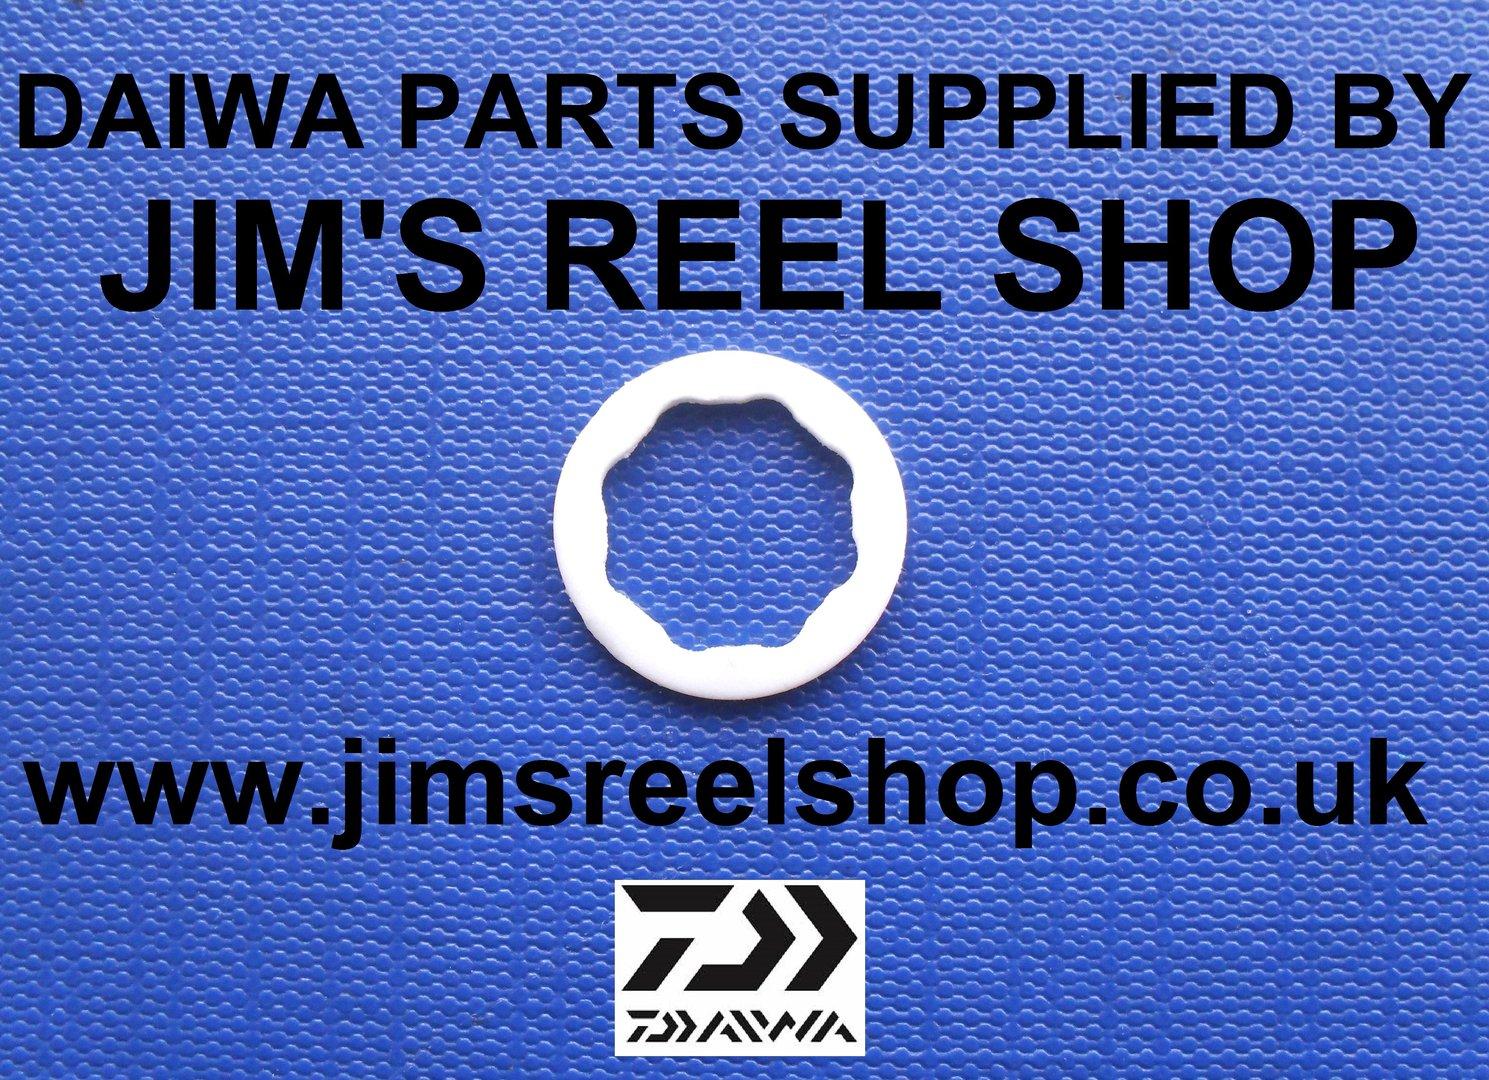 ca1e56137d5 DAIWA SALTIST 40/50 HA LEVEL WIND COG E62-8701 - Jim's .. DAIWA TD-R SPOOL  LINE LAY ADJUSTMENT WASHER - Jim's Reel Shop